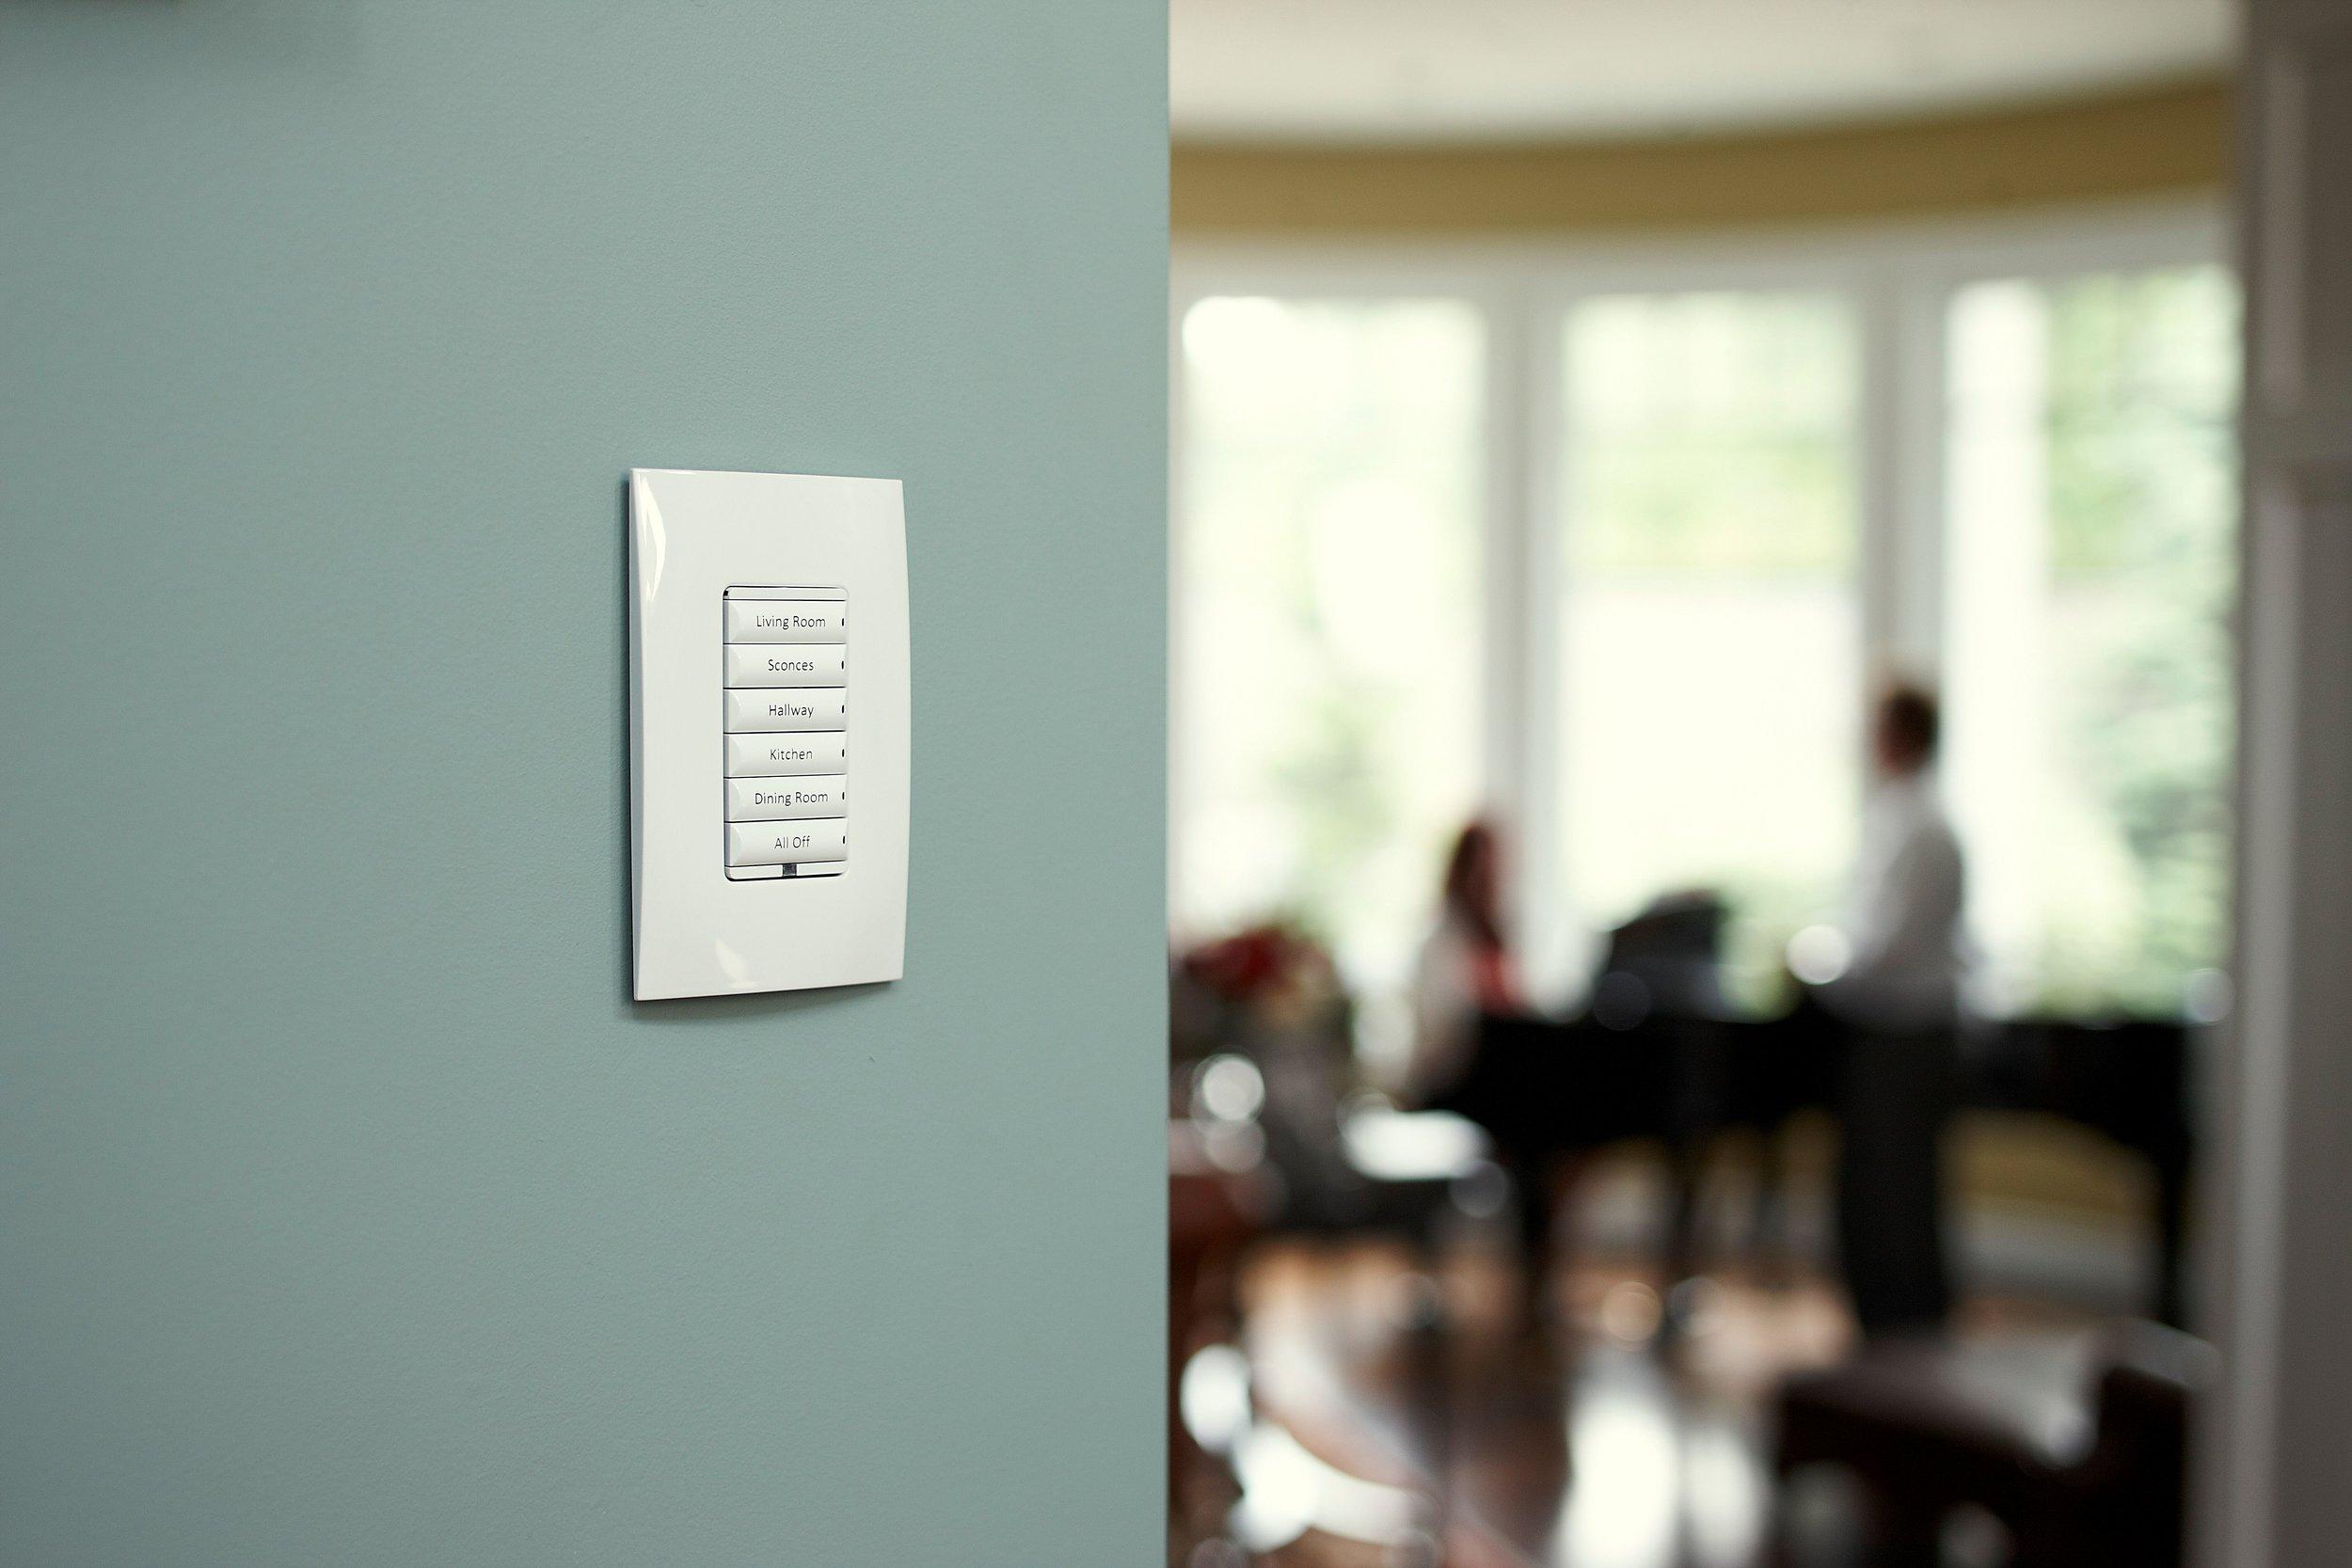 control4-lifestyle-7-5616x3744.jpg